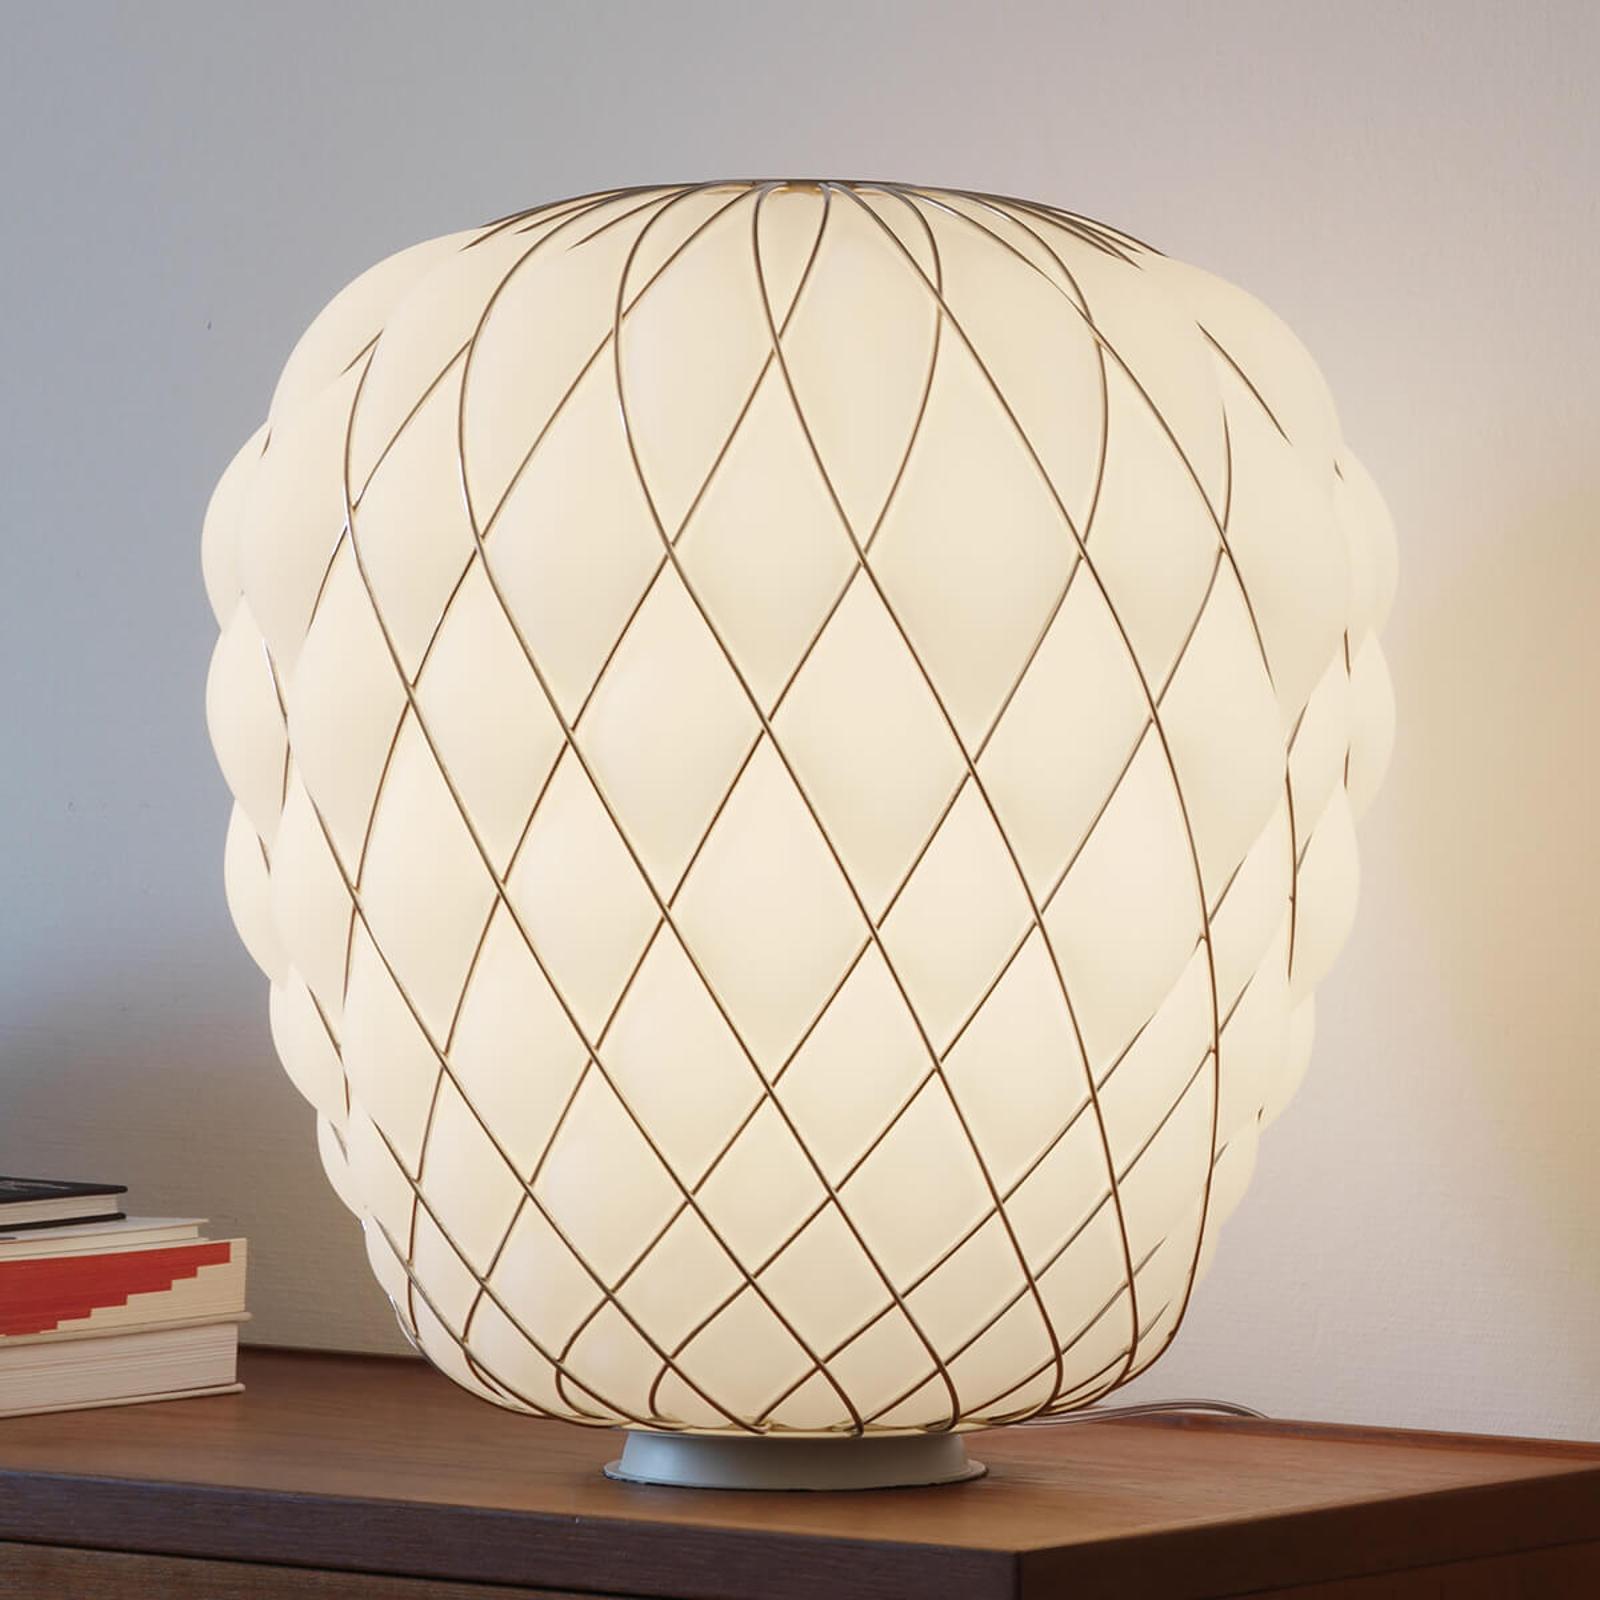 Lampe à poser de designer Pinecone en verre opale